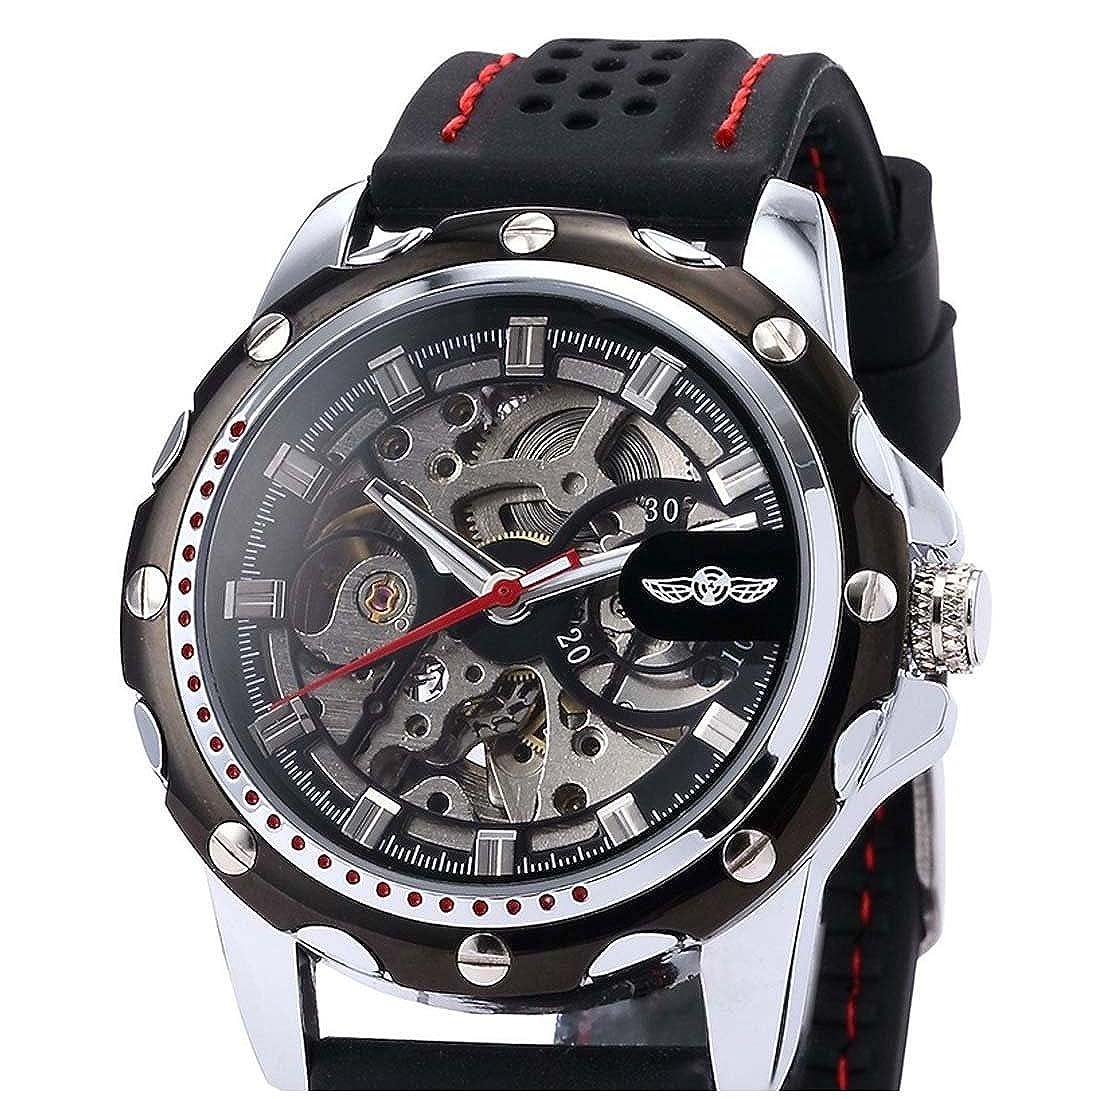 Hombre Reloj - winner Reloj Hombre Esqueleto Mecanico Automatico, Correa de Silicona Negro PMW081: Amazon.es: Relojes